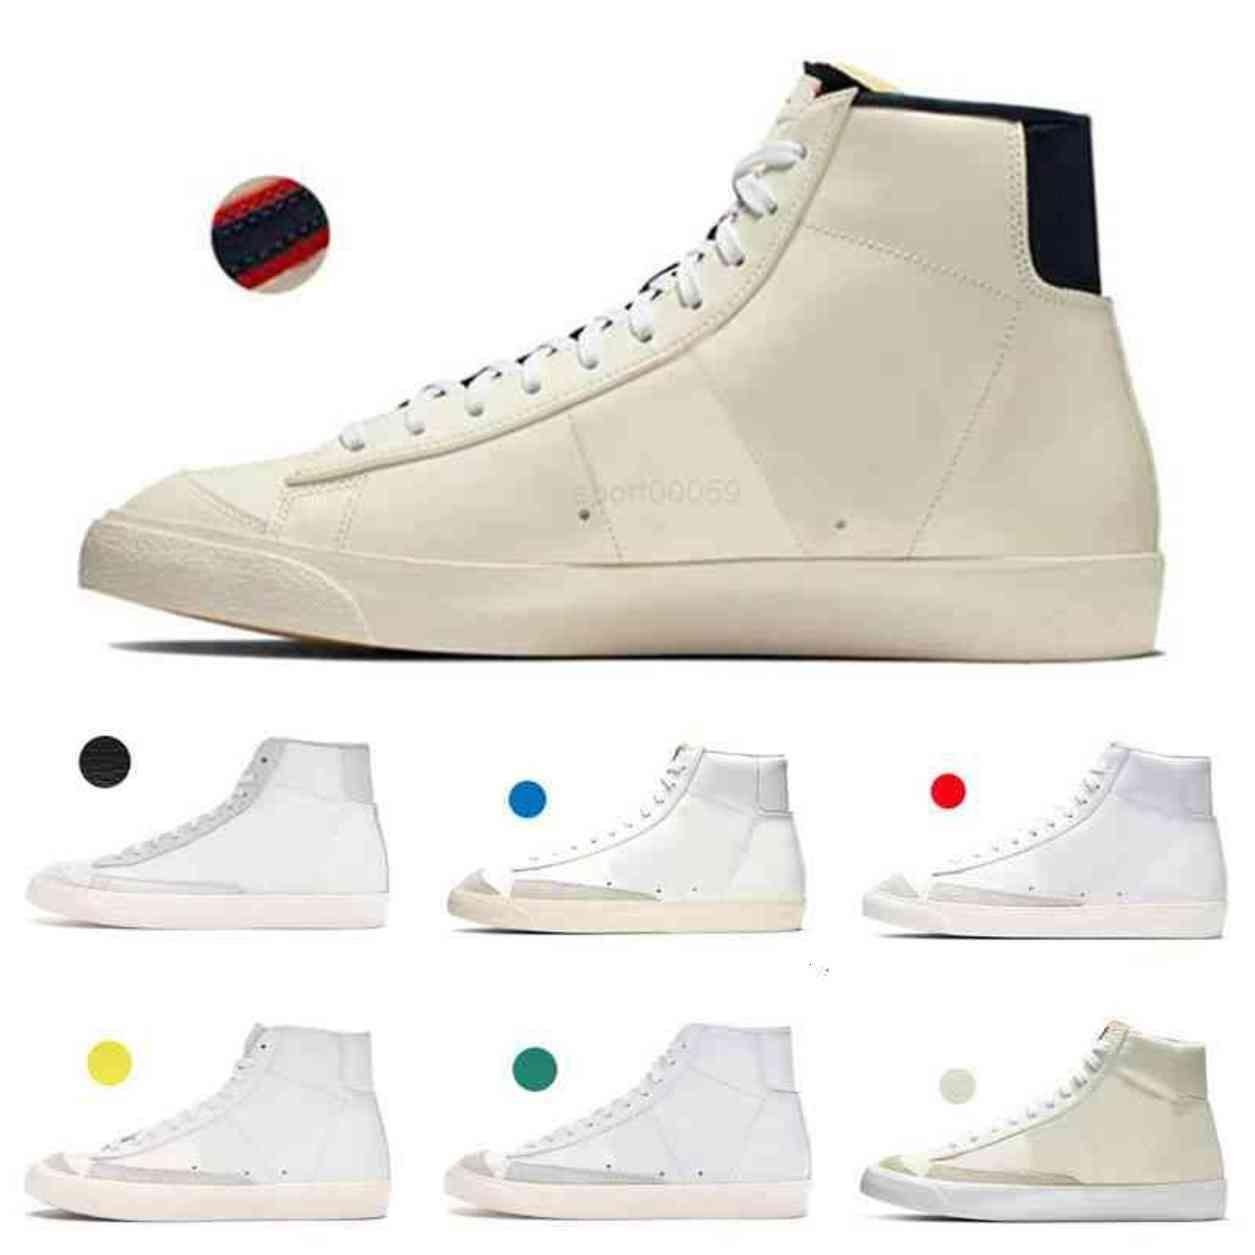 Blazer Mid 77 أحذية أطفال Lucid Green Sail White Chicago و Toronto Canvas Pacific Blue Habanero Red